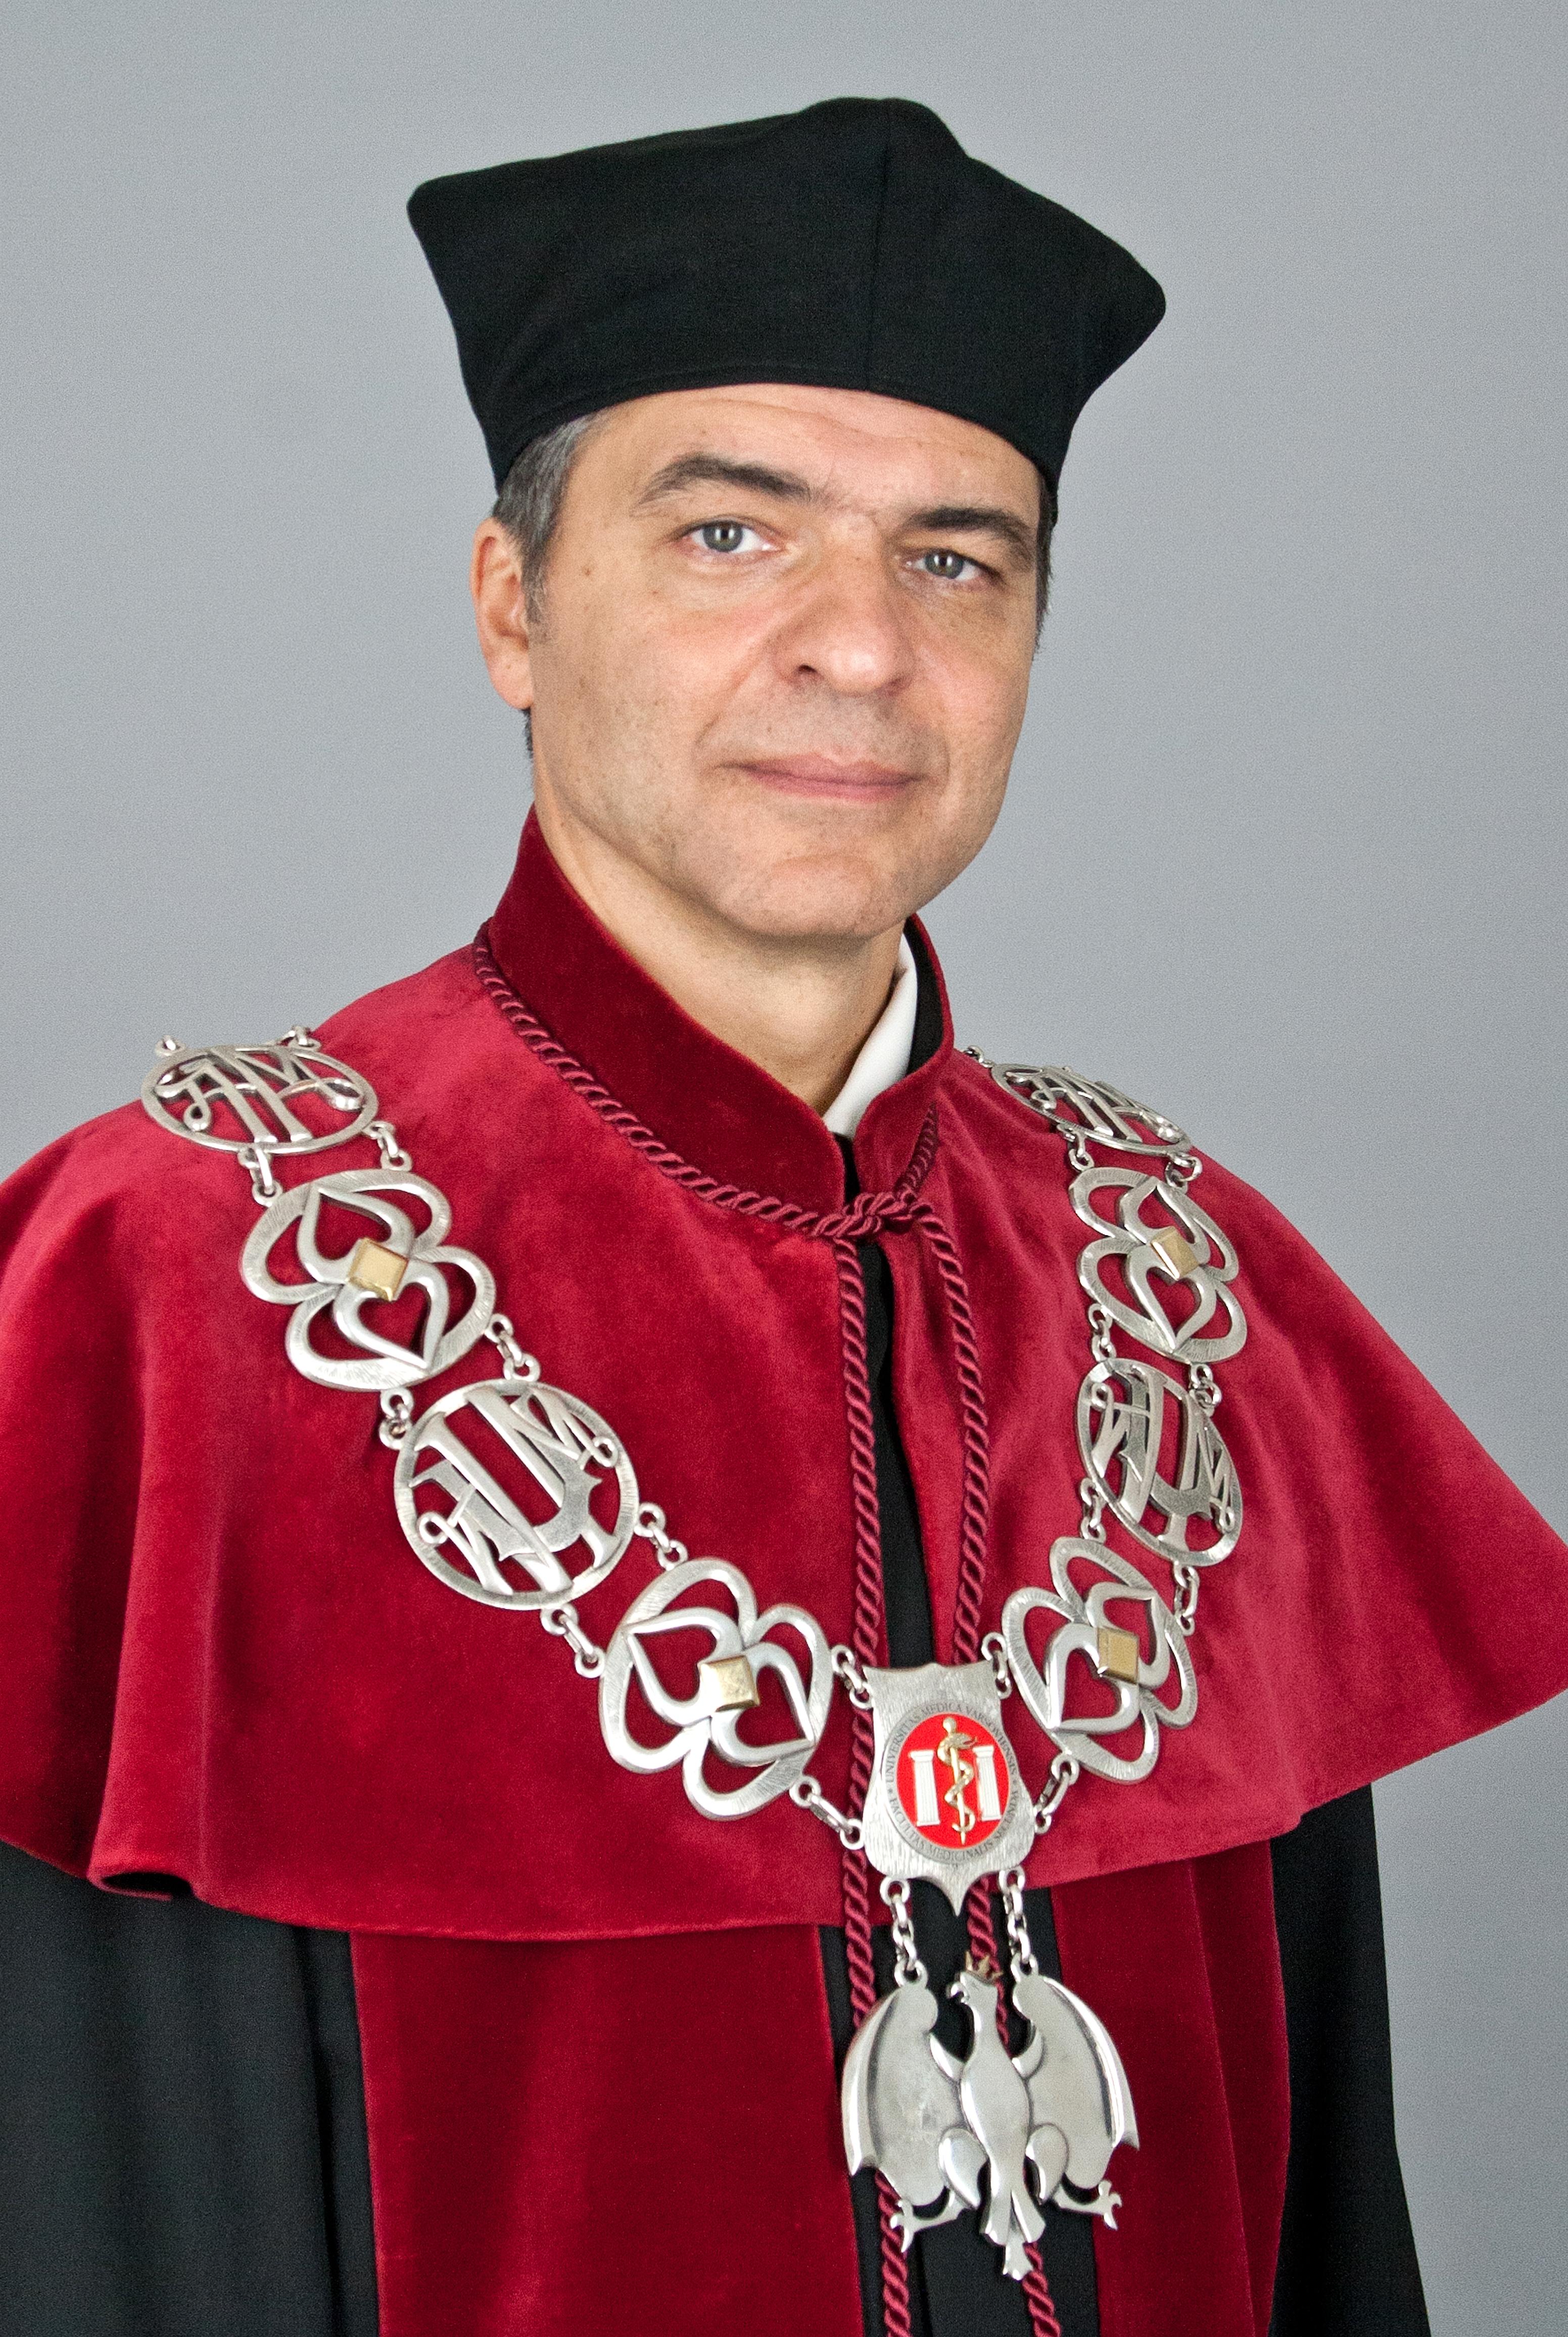 Marek Kuch, Dean